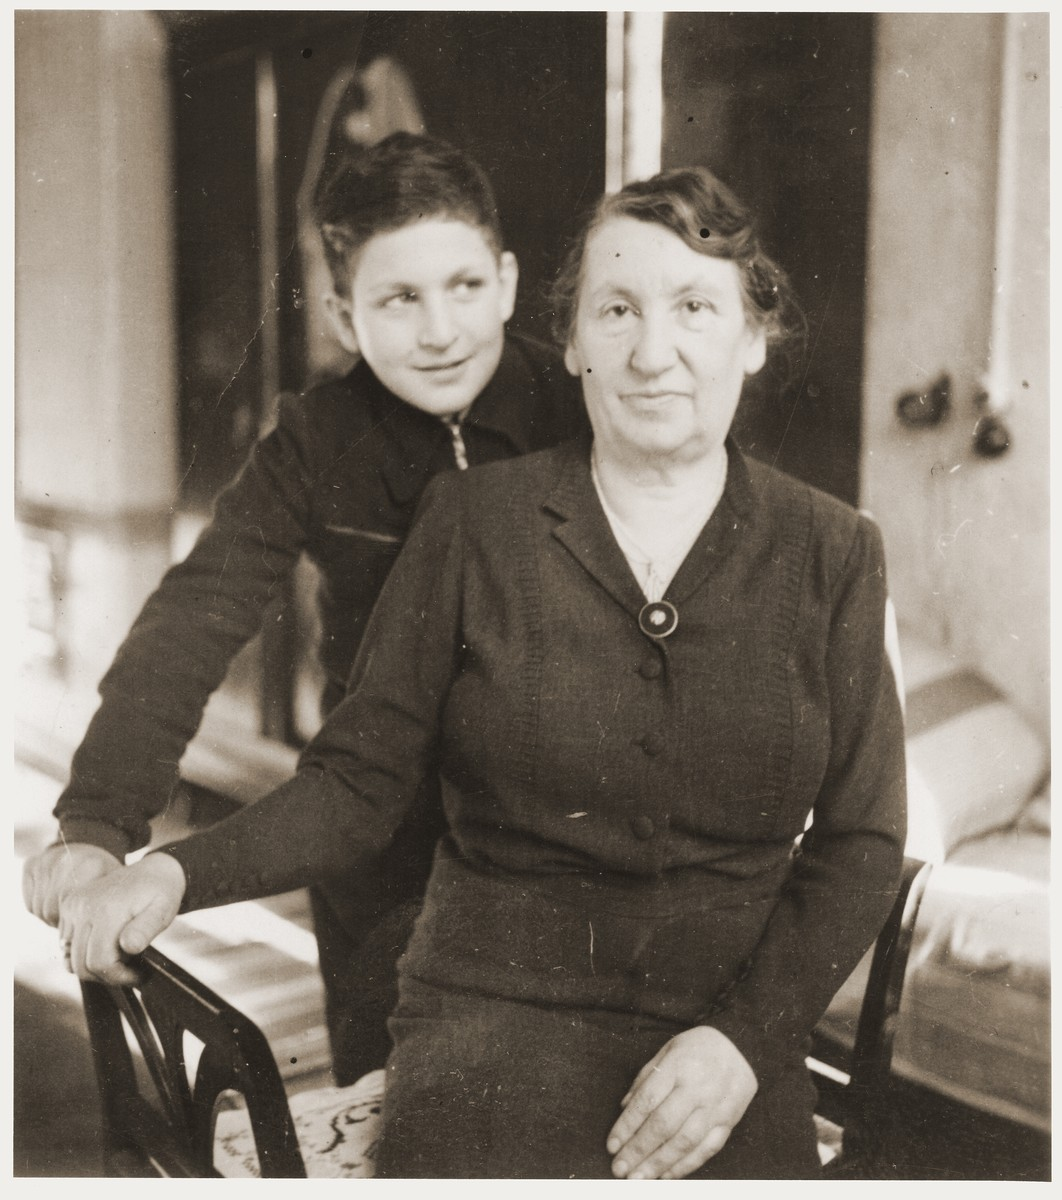 Fruma Rabinovitch, nee Fraenkel, with her grandson, Shmuel.